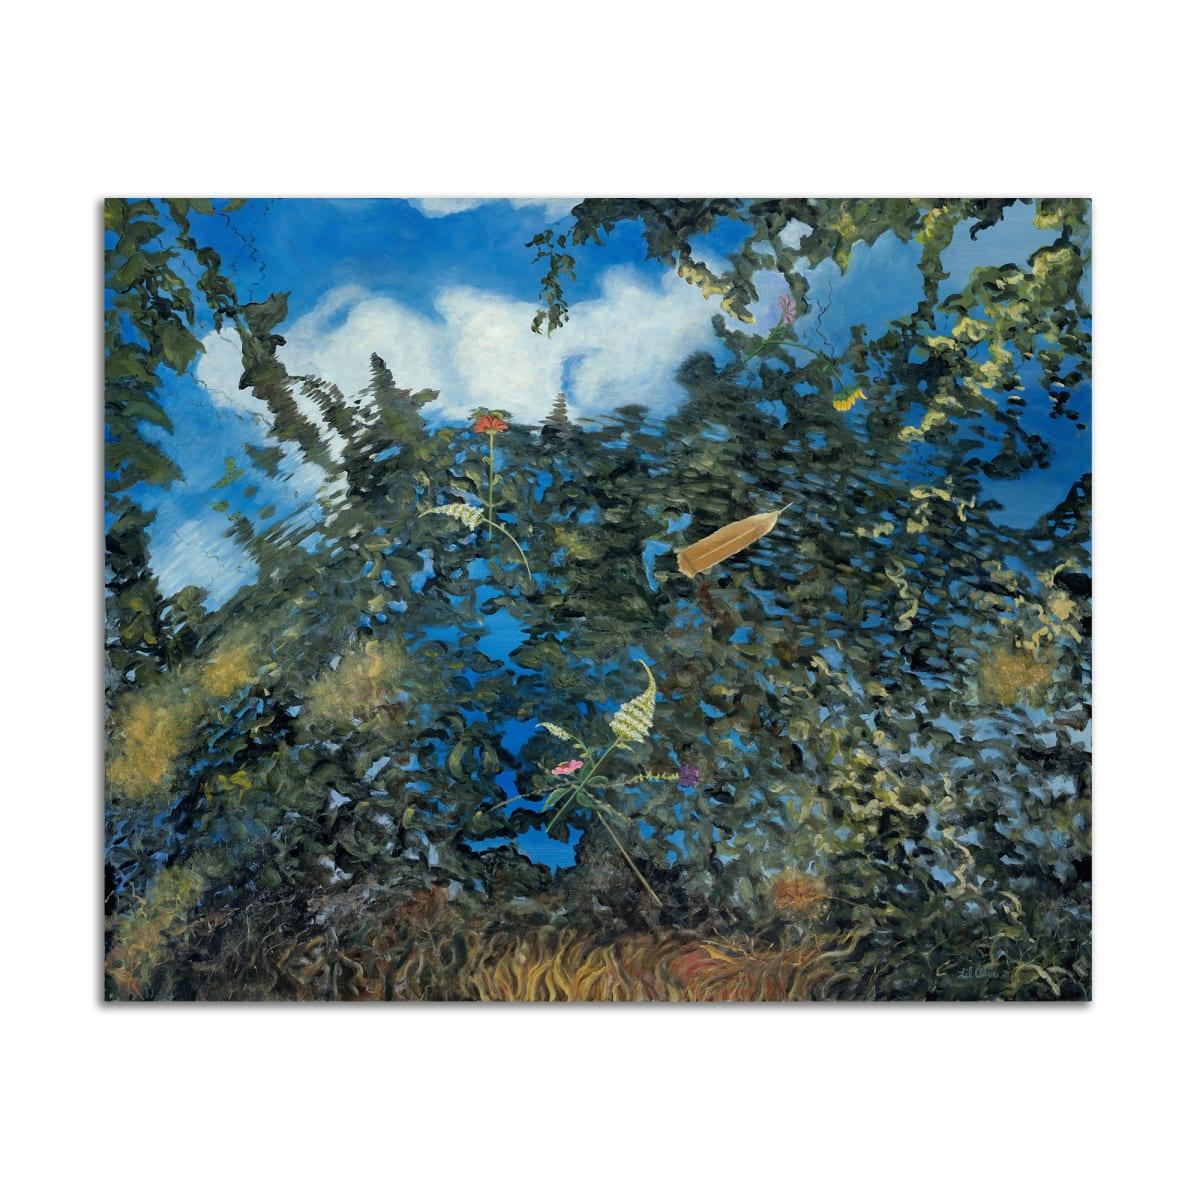 Endless Harvest by Lil Olive